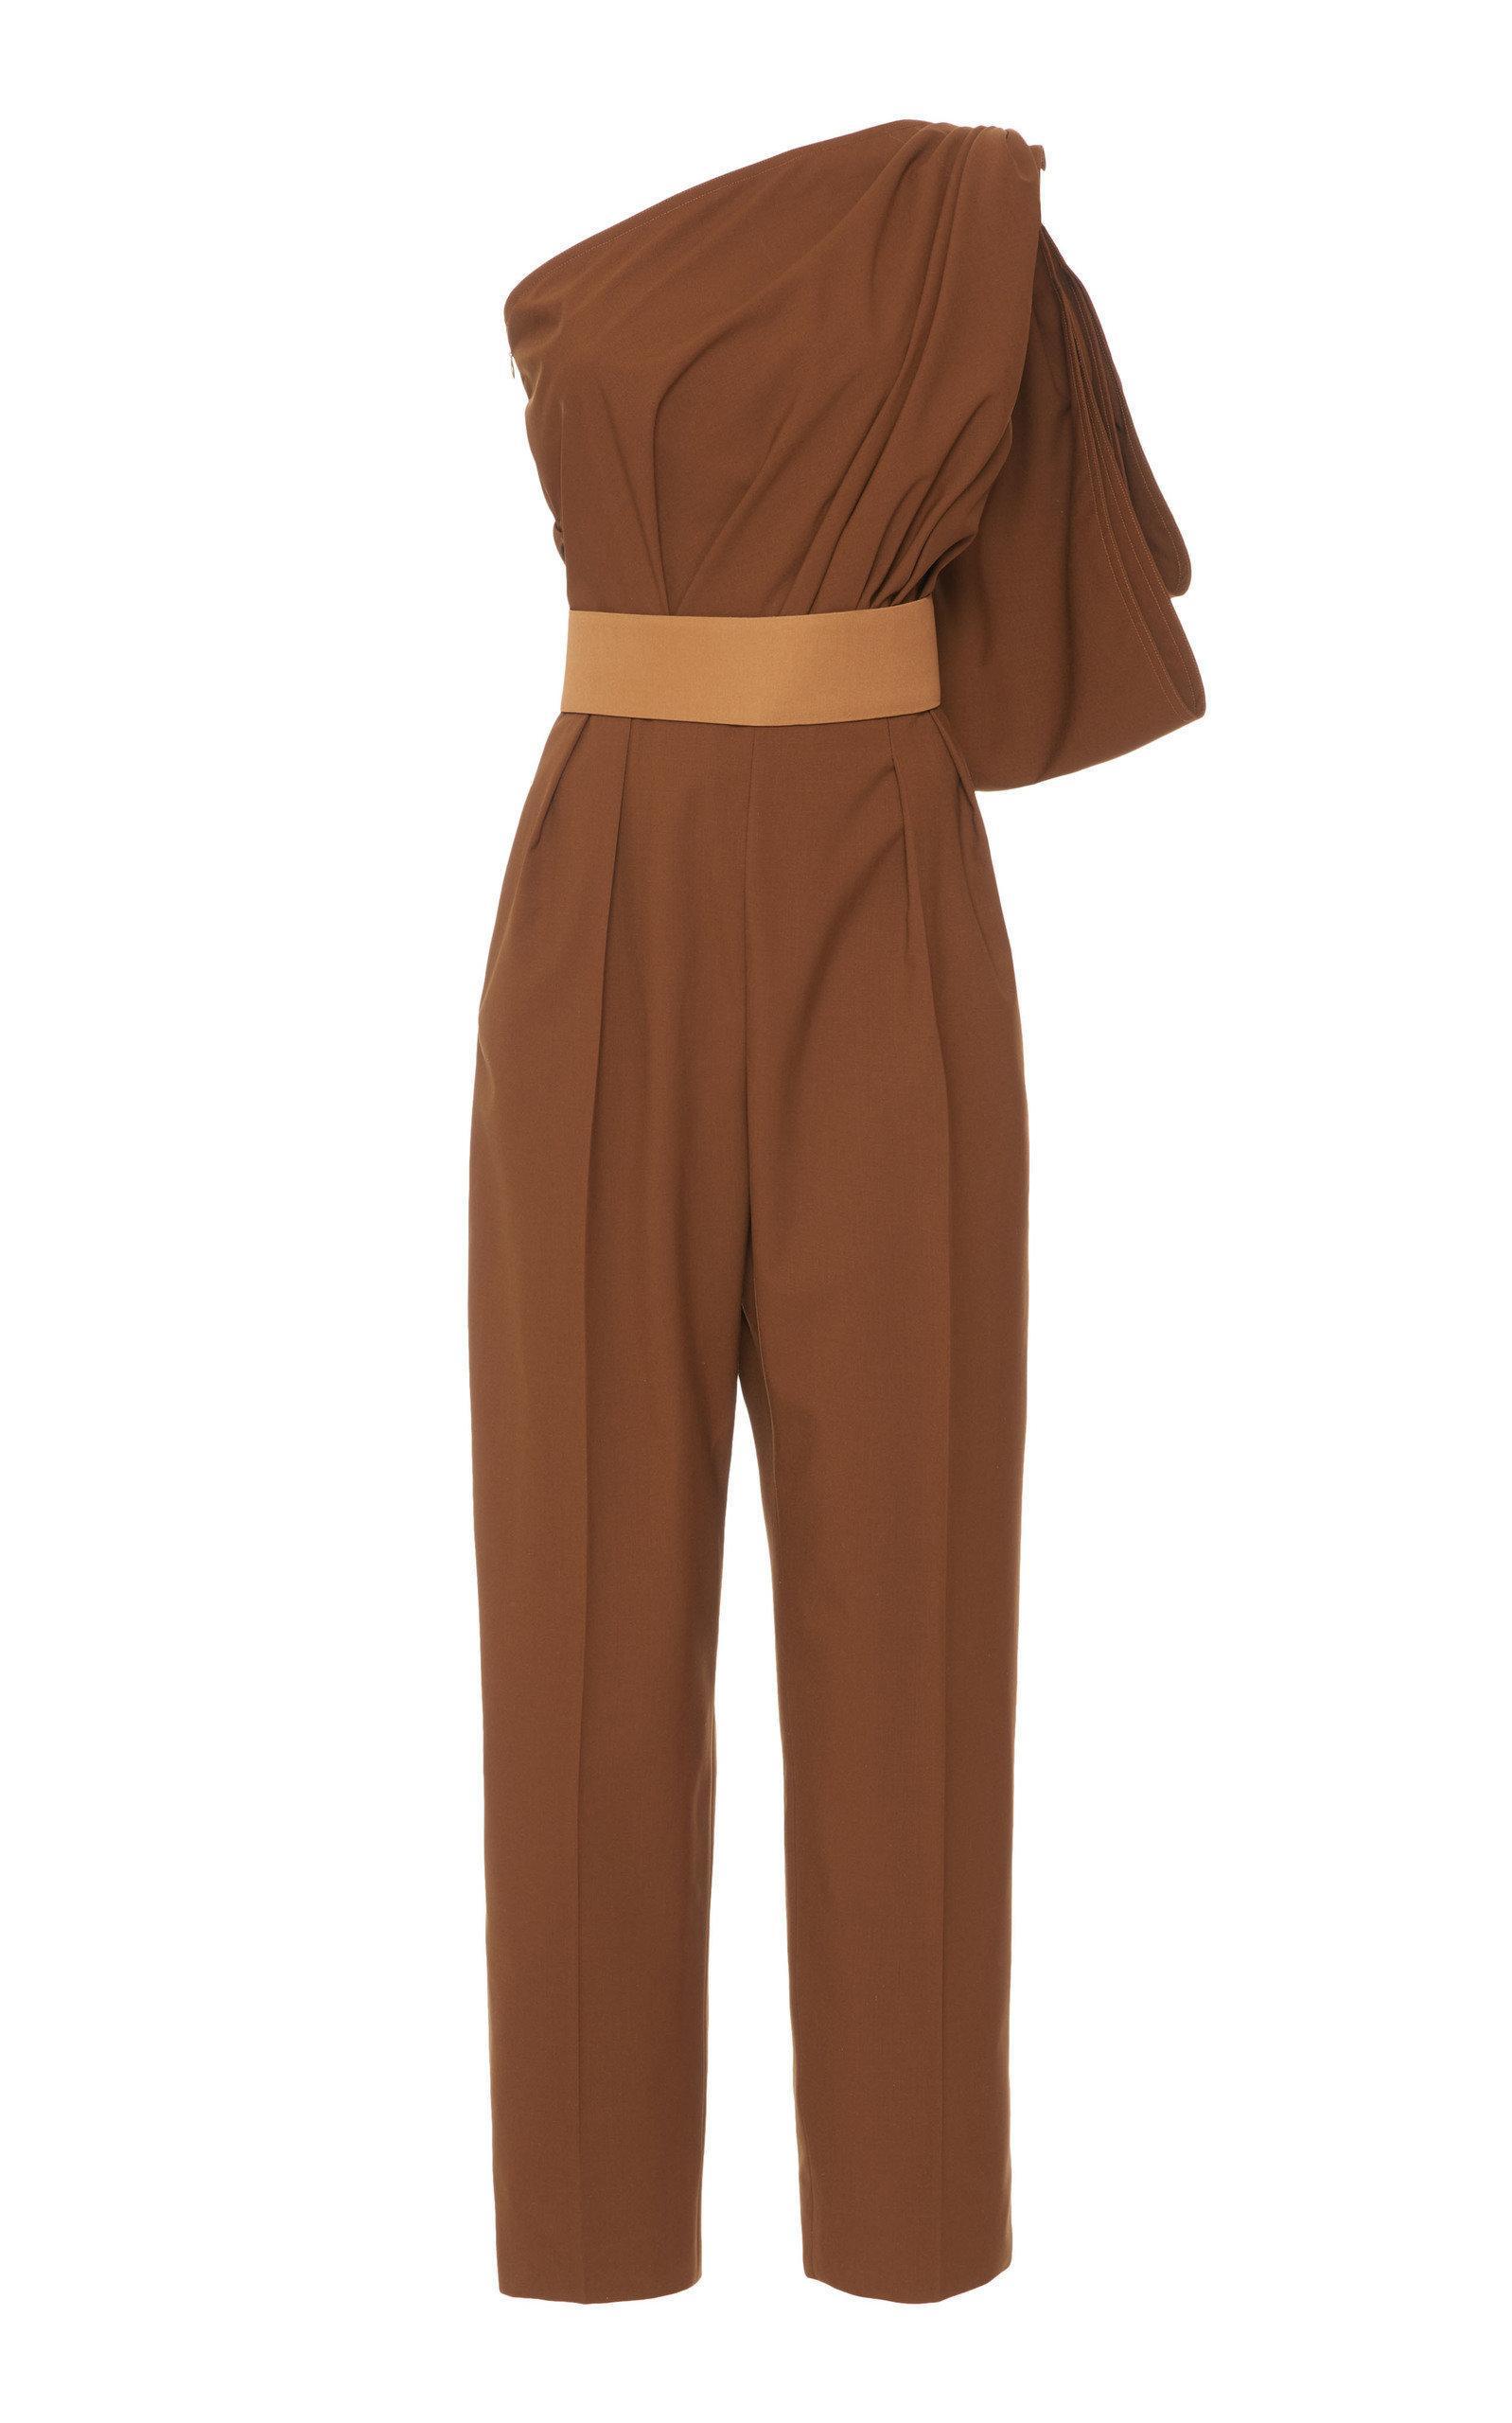 862b9227064 Max Mara Avola One-Shoulder Cotton-Poplin Jumpsuit In Brown